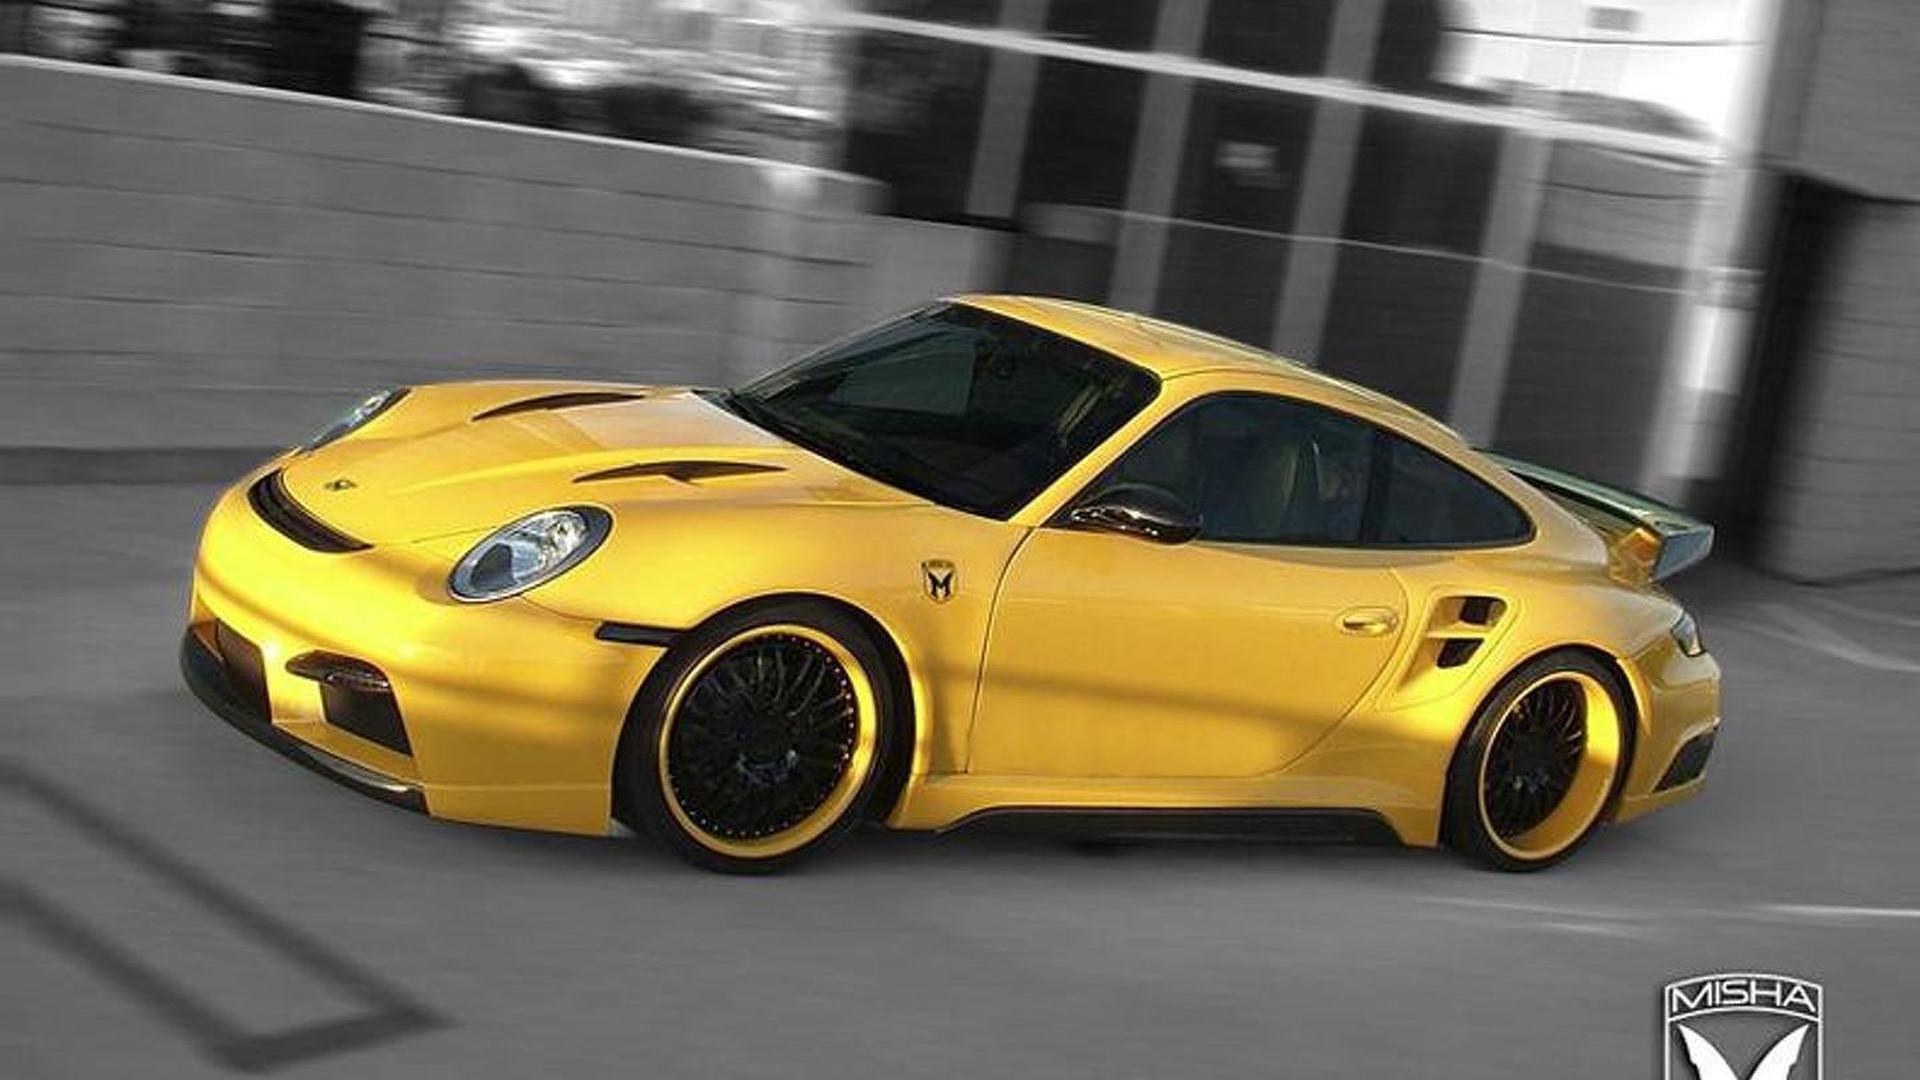 2010-207438-porsche-911-turbo-body-kit-by-misha-design-772-30-07-20101 Stunning Porsche 911 Gt2 Body Kit Cars Trend